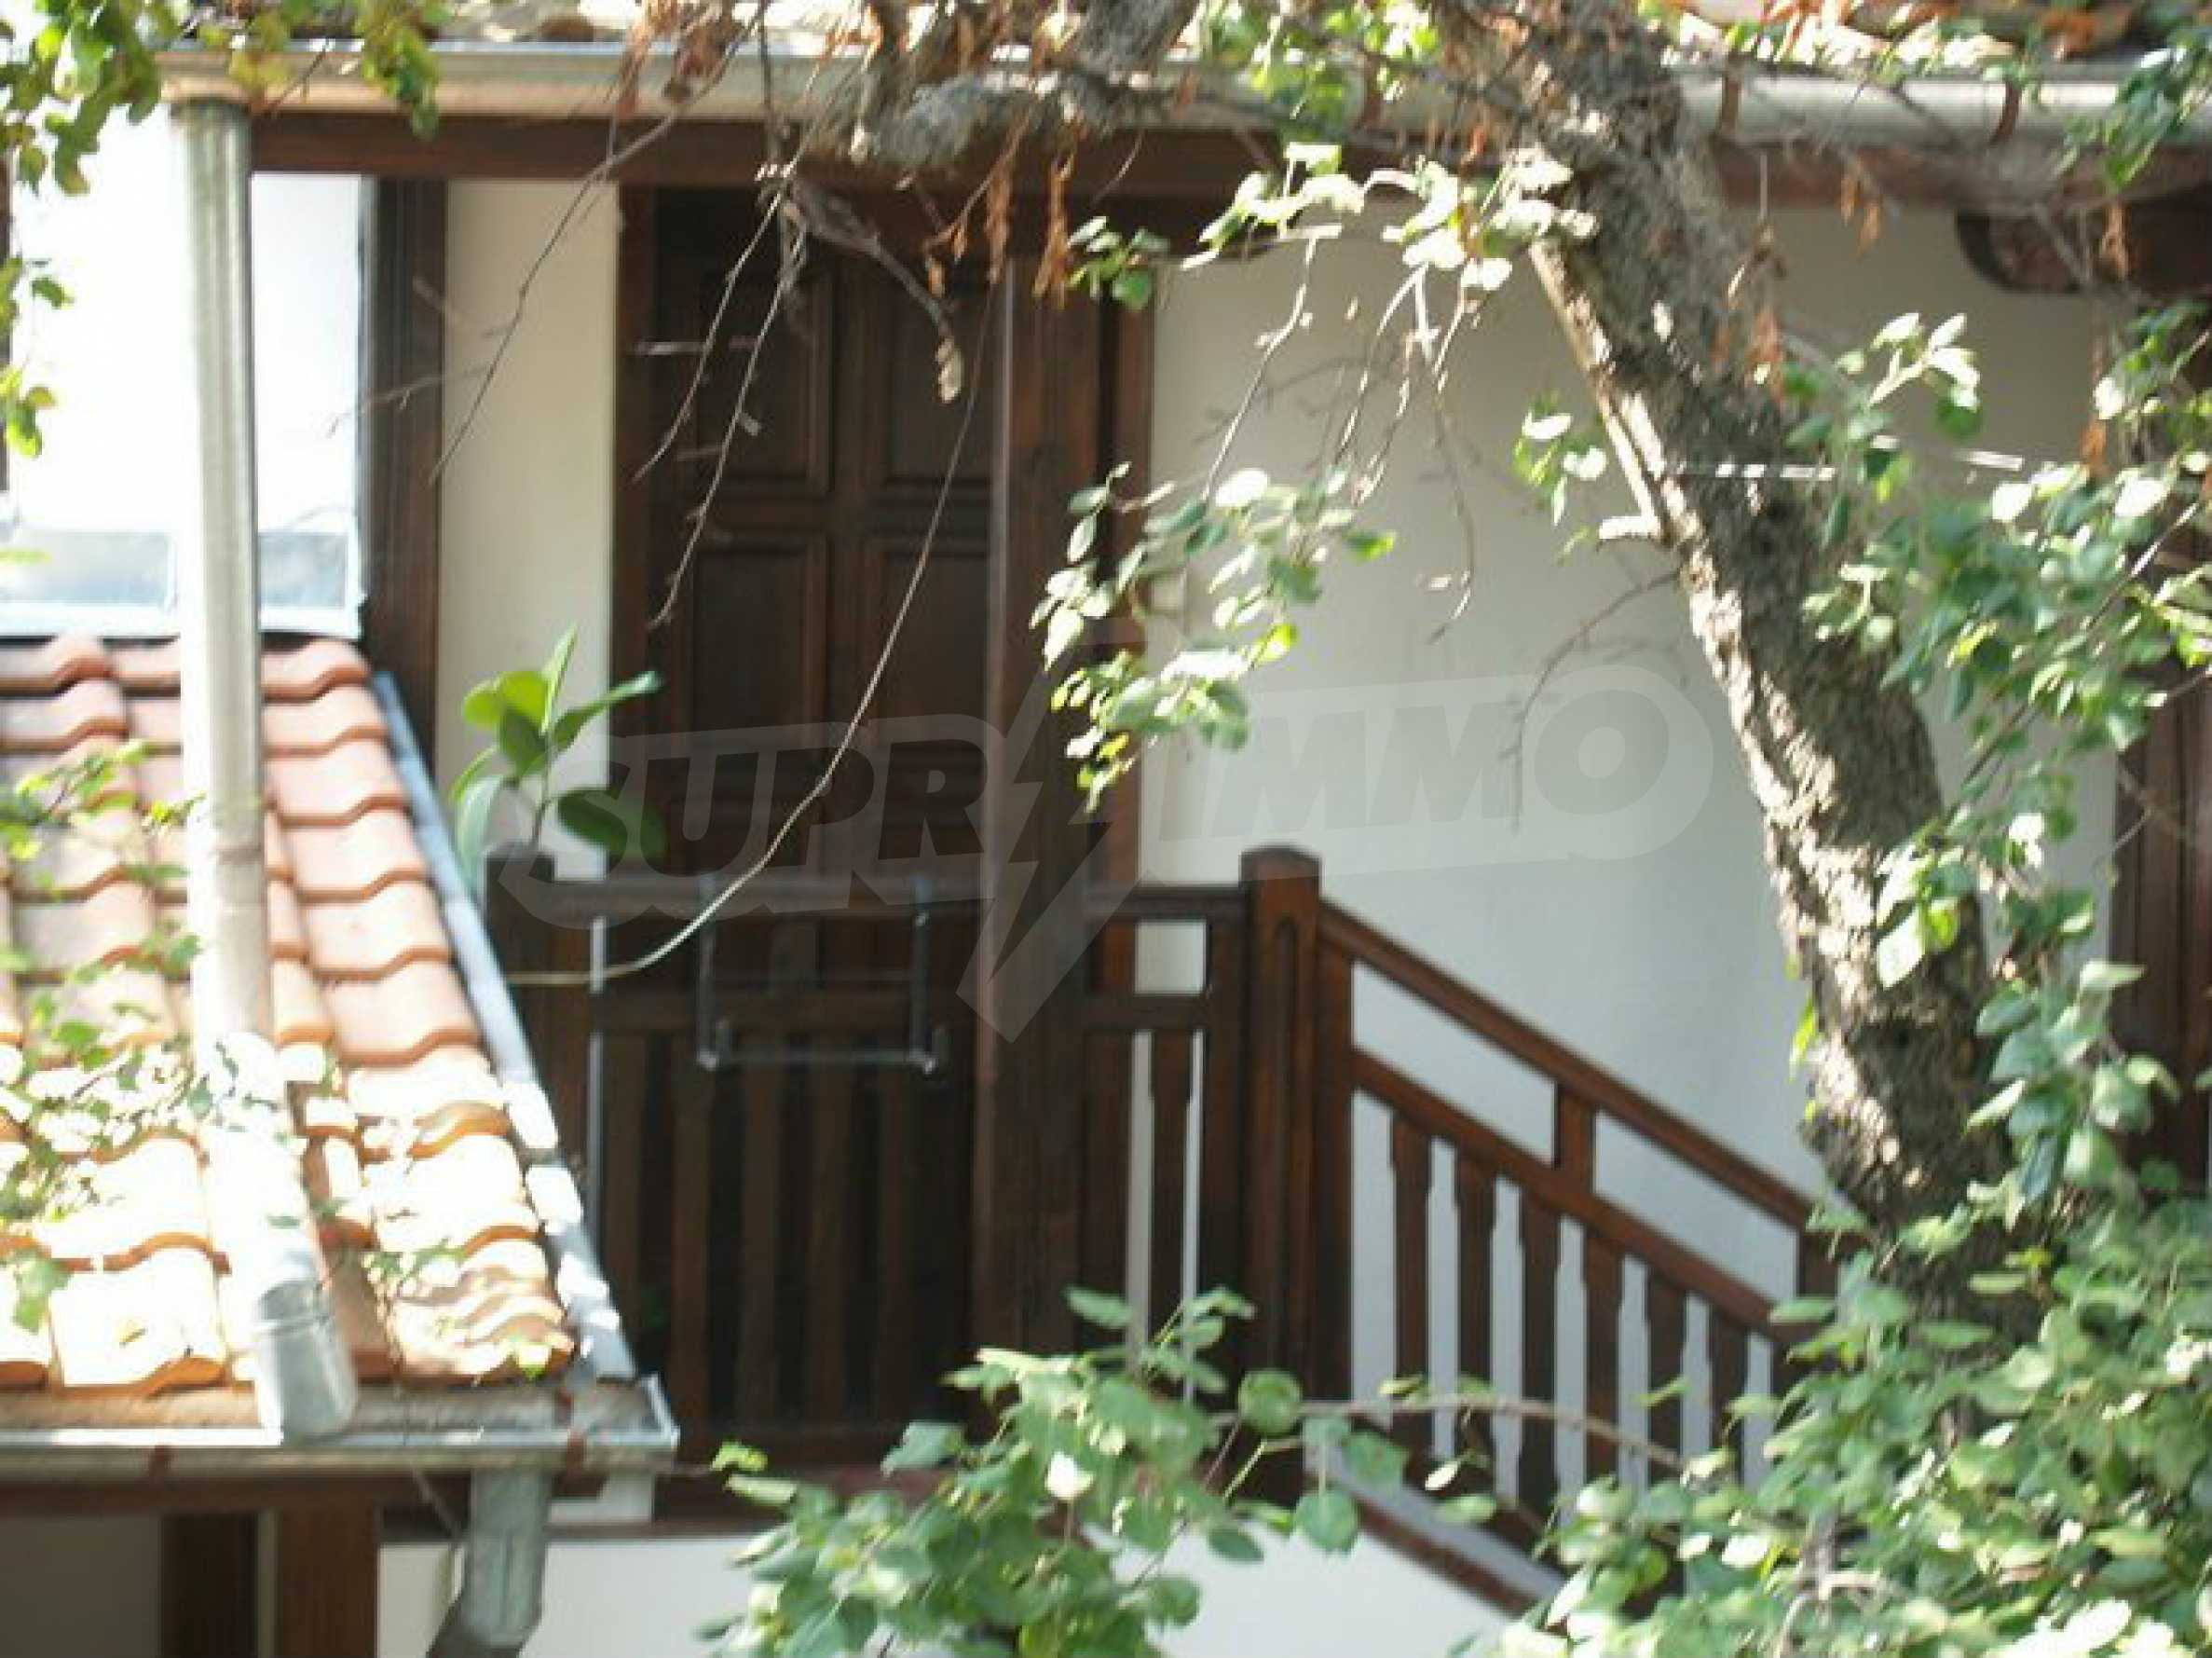 Hotelanlage mit Restaurant am Ufer des Flusses Osam in Lovech 16